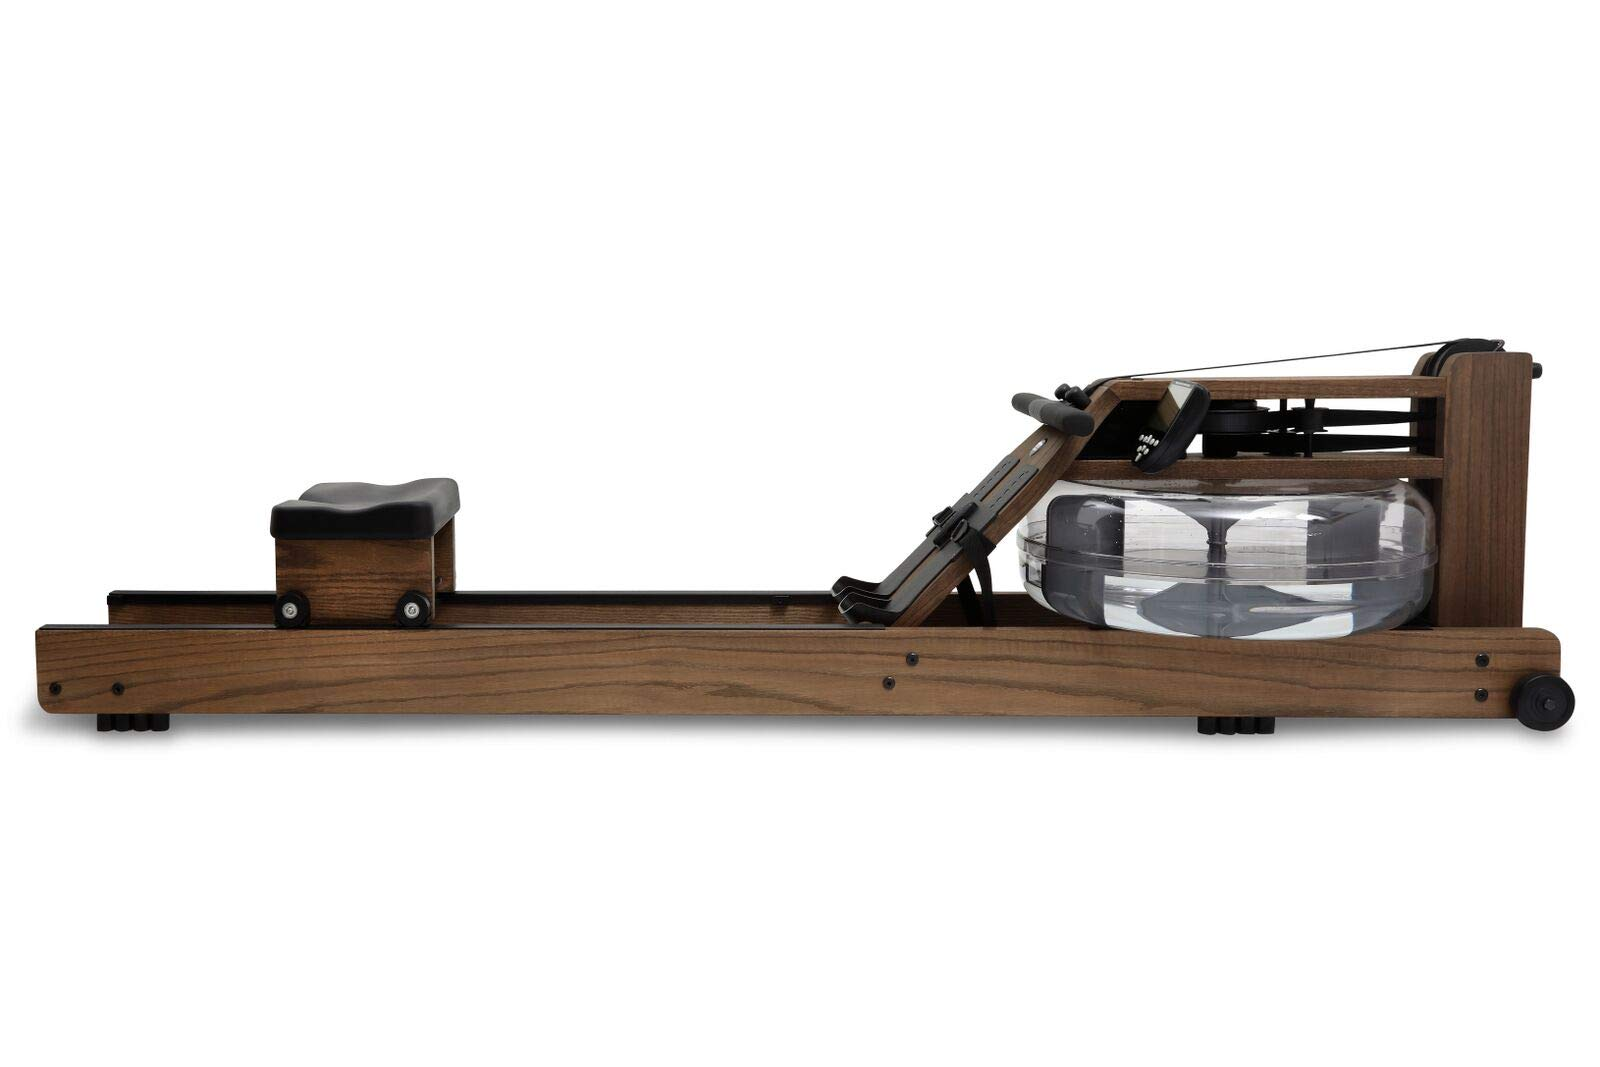 WaterRower Vintage Oak Rowing Machine with S4 by WaterRower (Image #7)